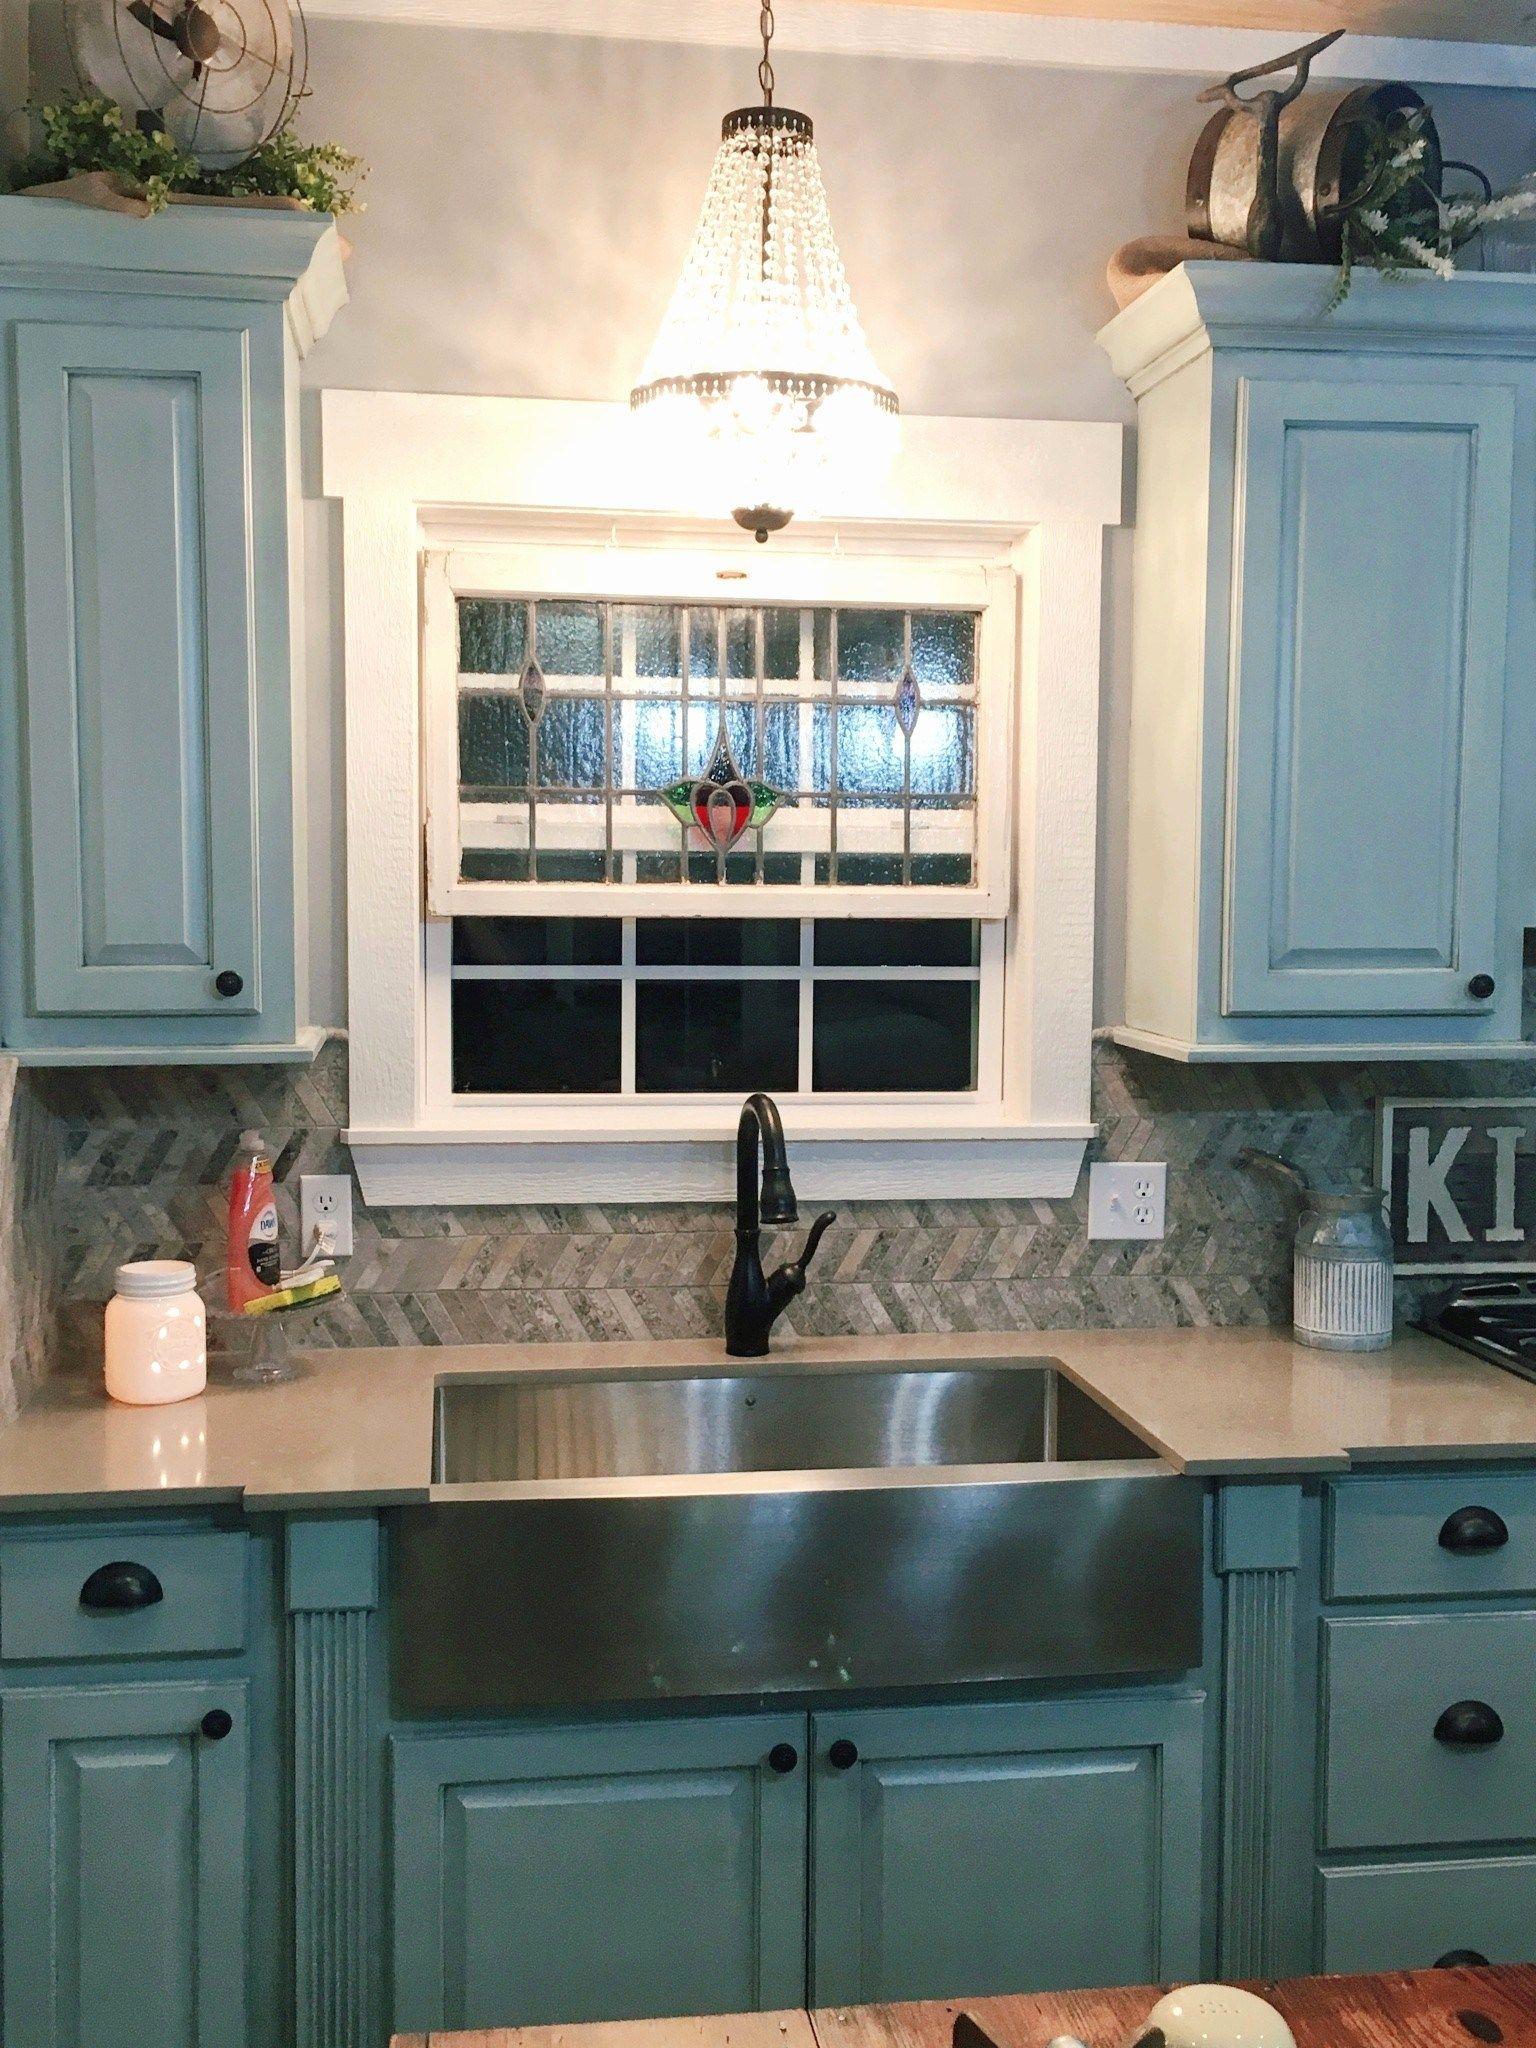 pendant light over kitchen sink